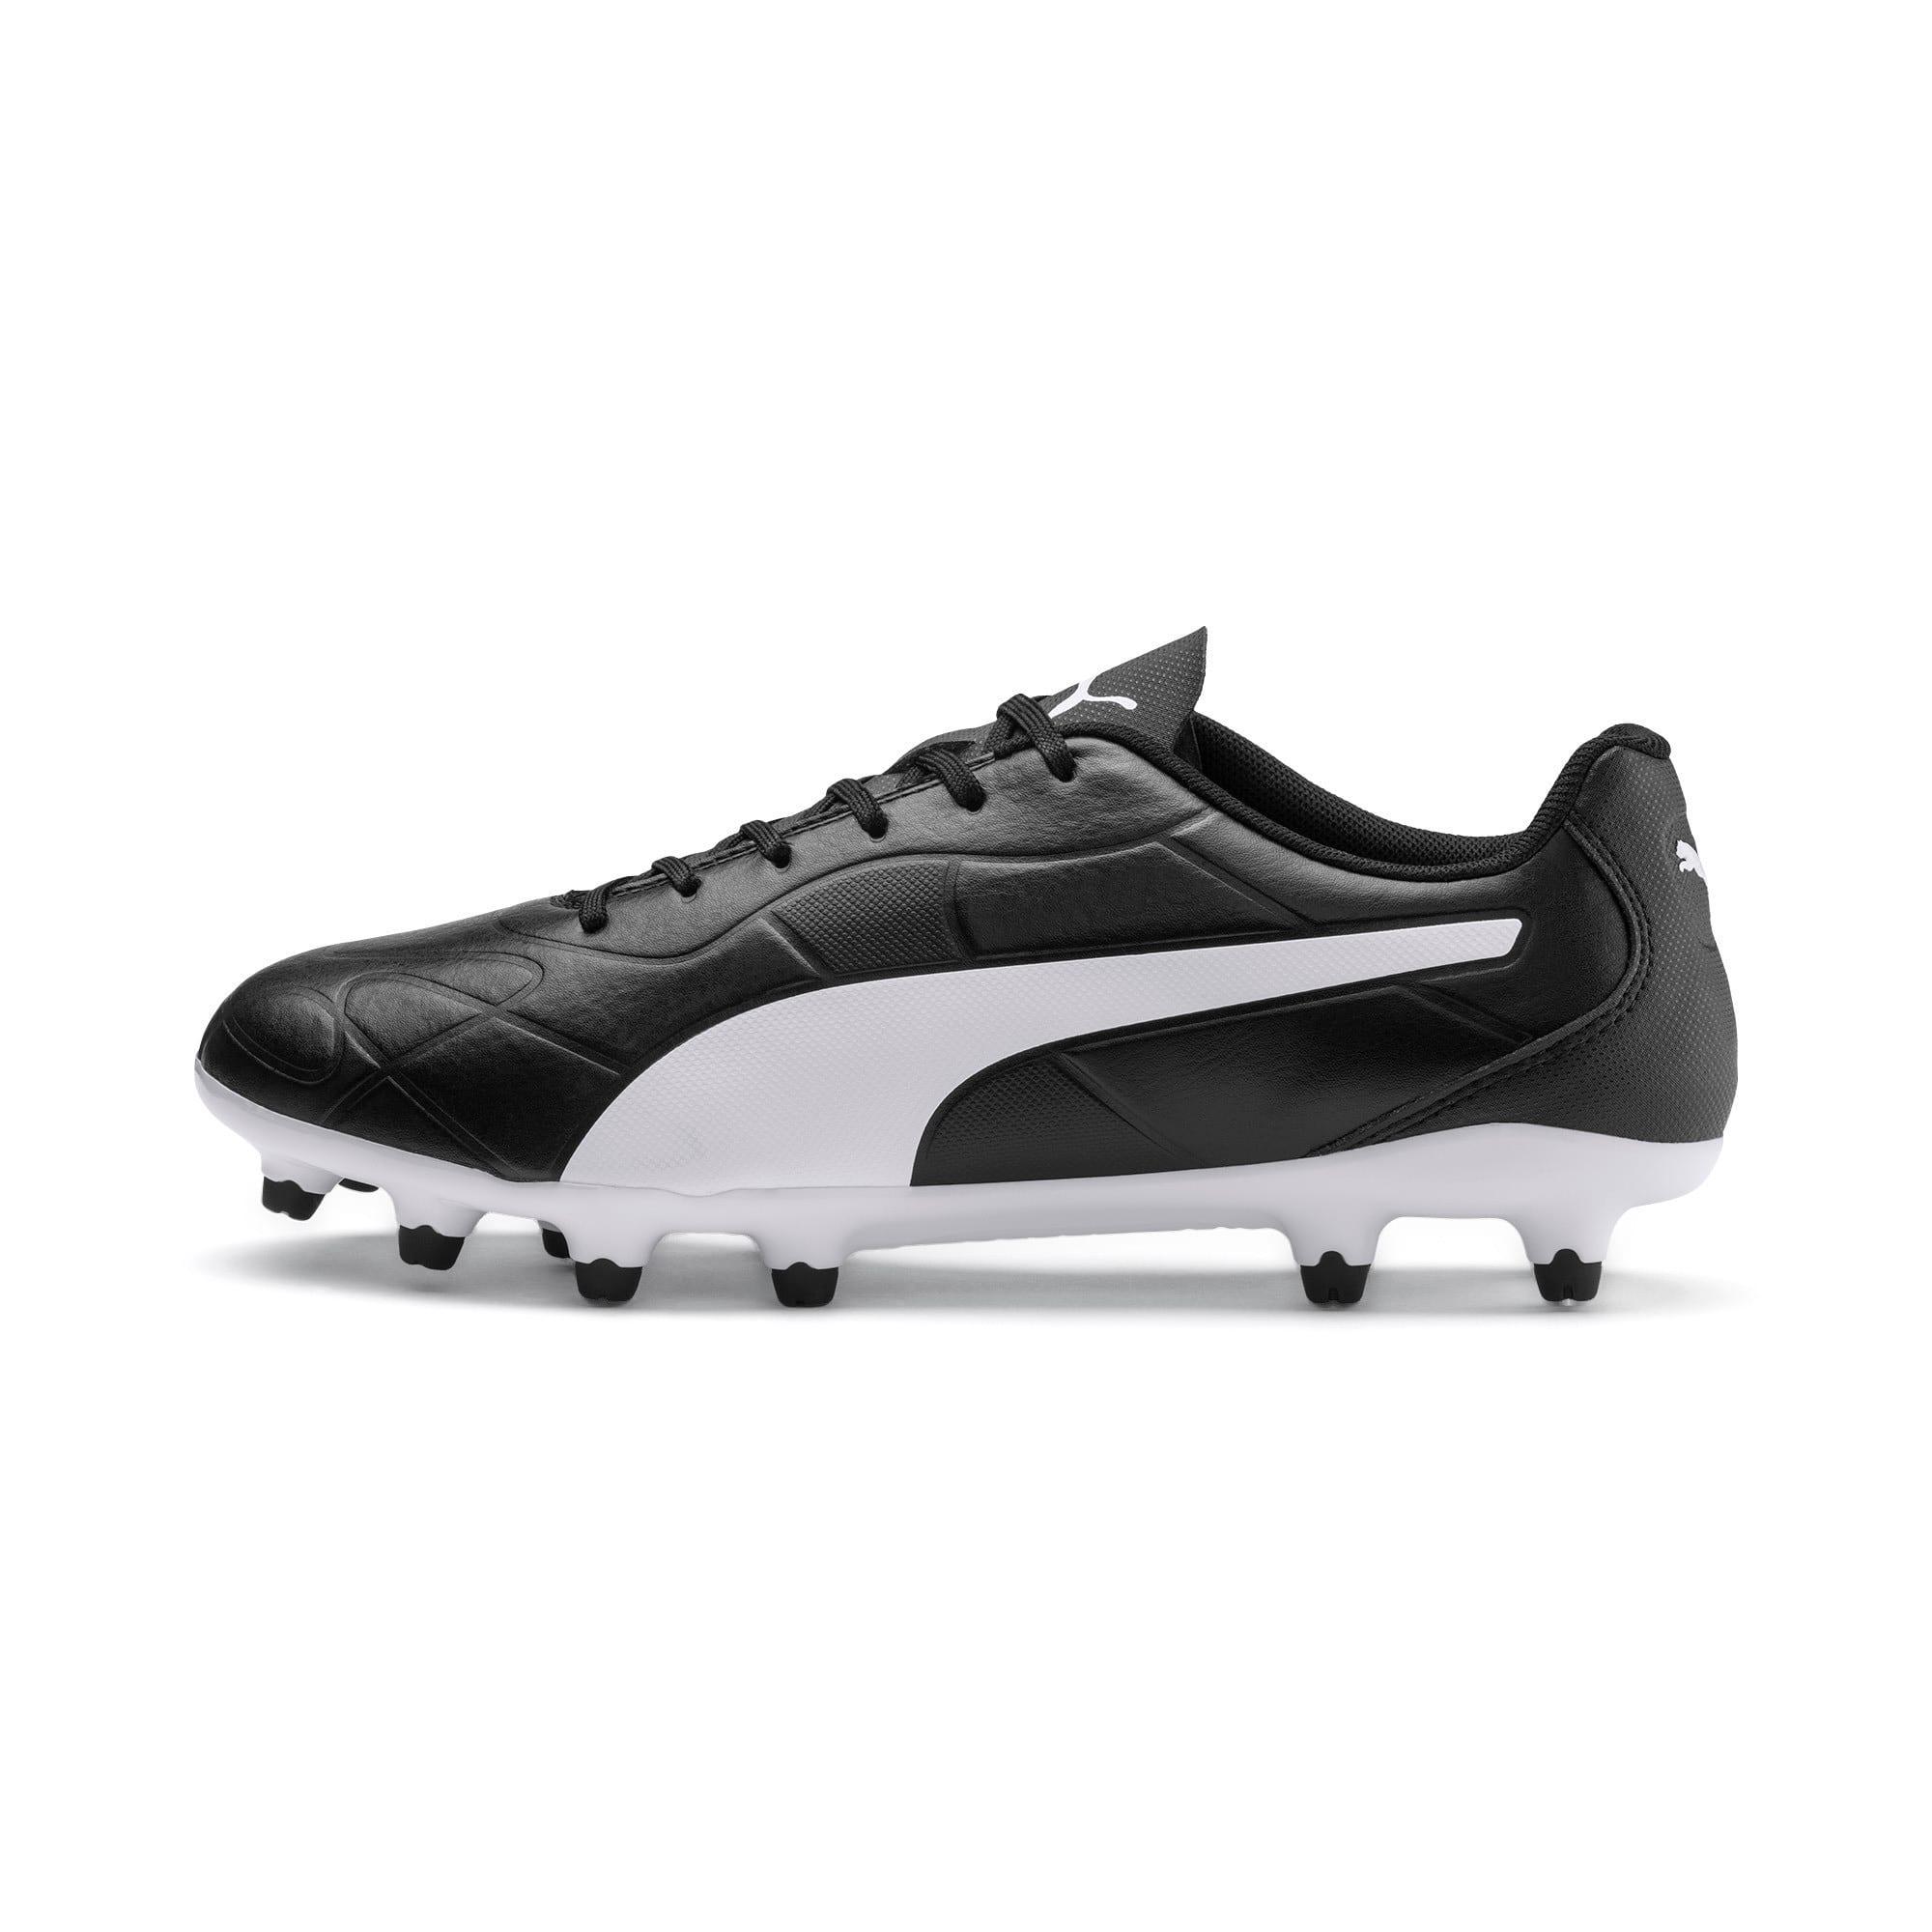 Thumbnail 1 of Monarch FG Men's Football Boots, Puma Black-Puma White, medium-IND